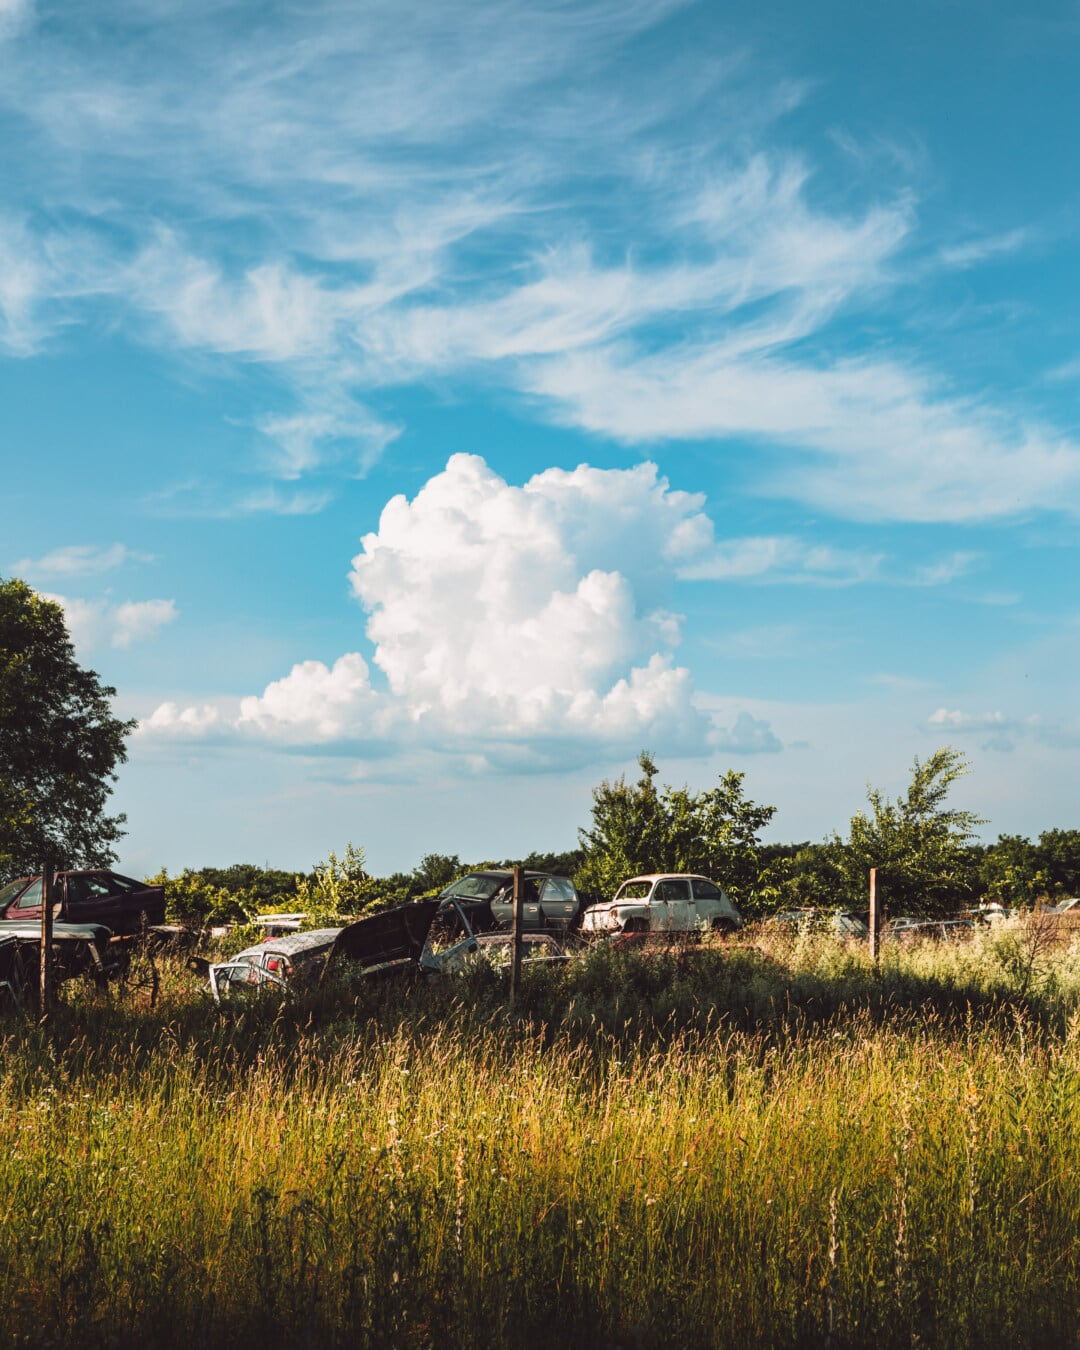 cars, junk, junkyard, garbage, rural, abandoned, decay, old, field, landscape